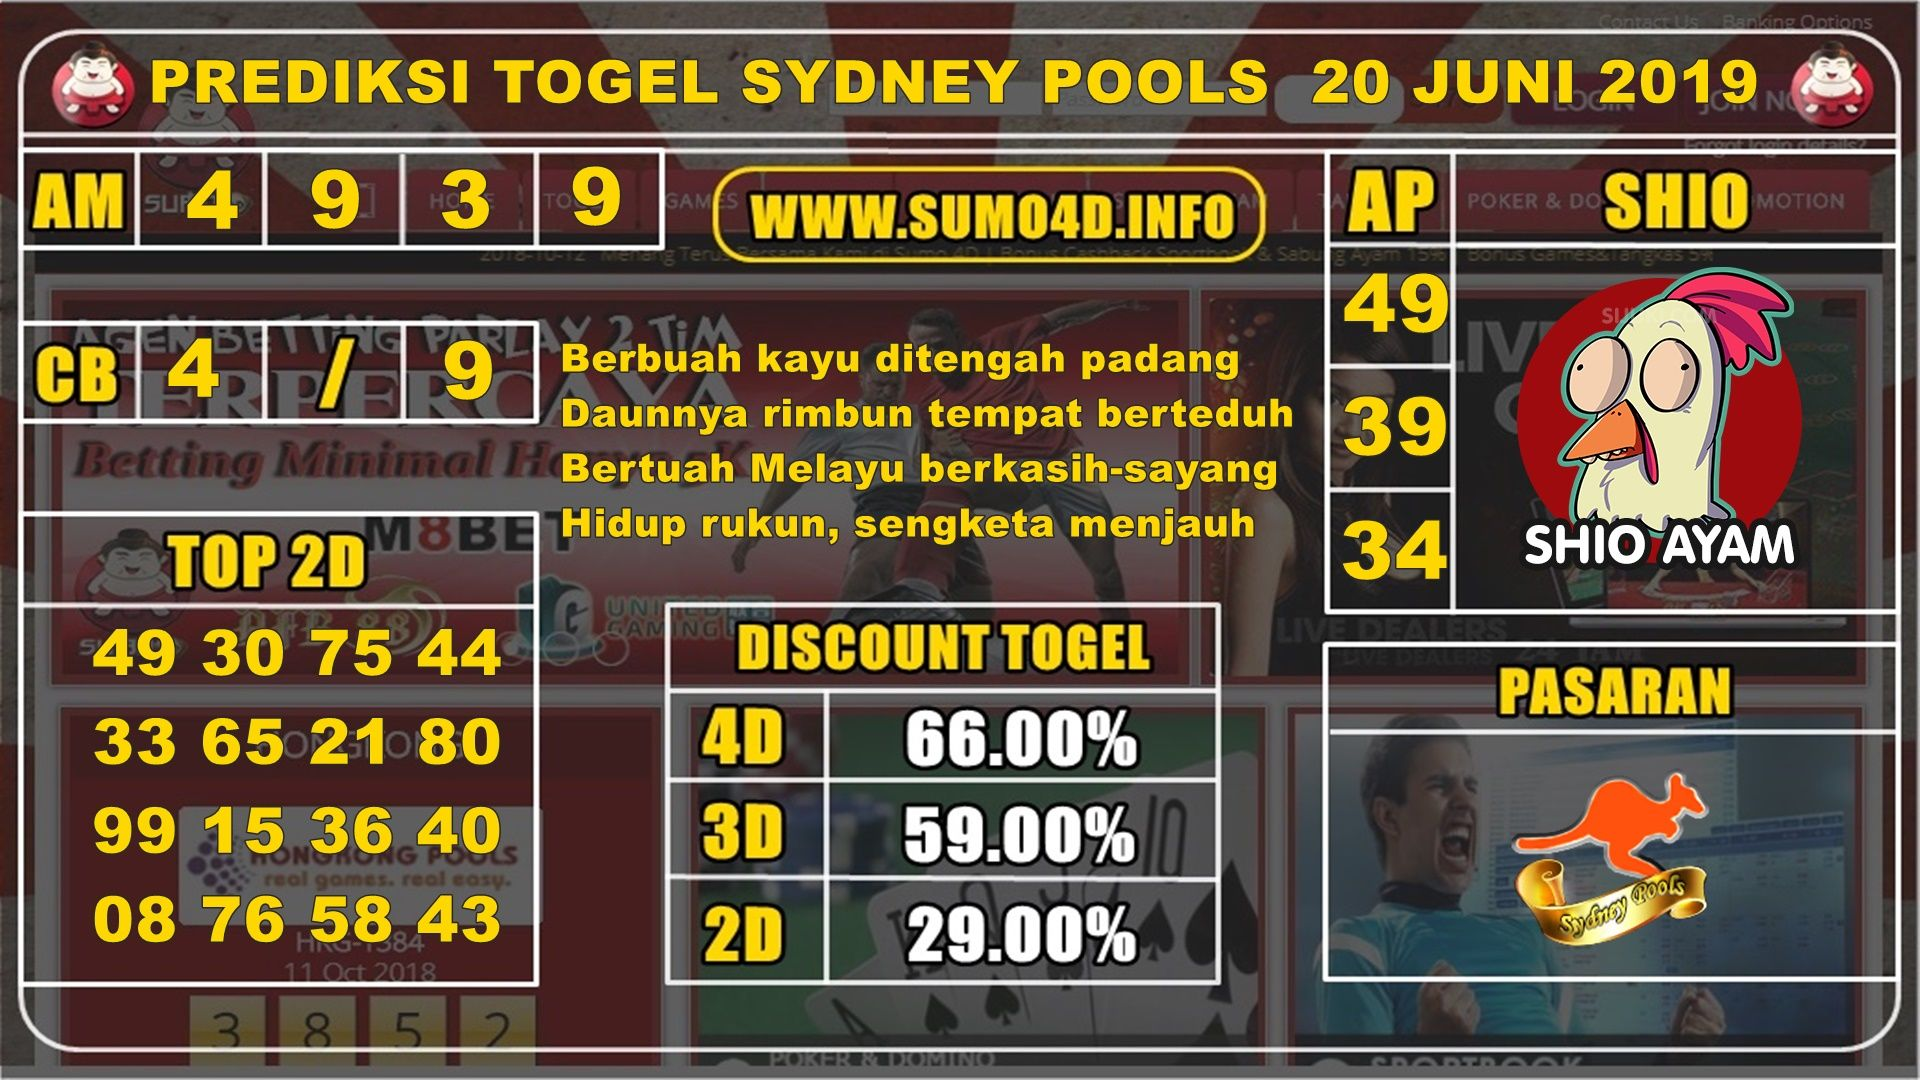 Judionline Judibola Togelonline Bandartogel Pokeronline